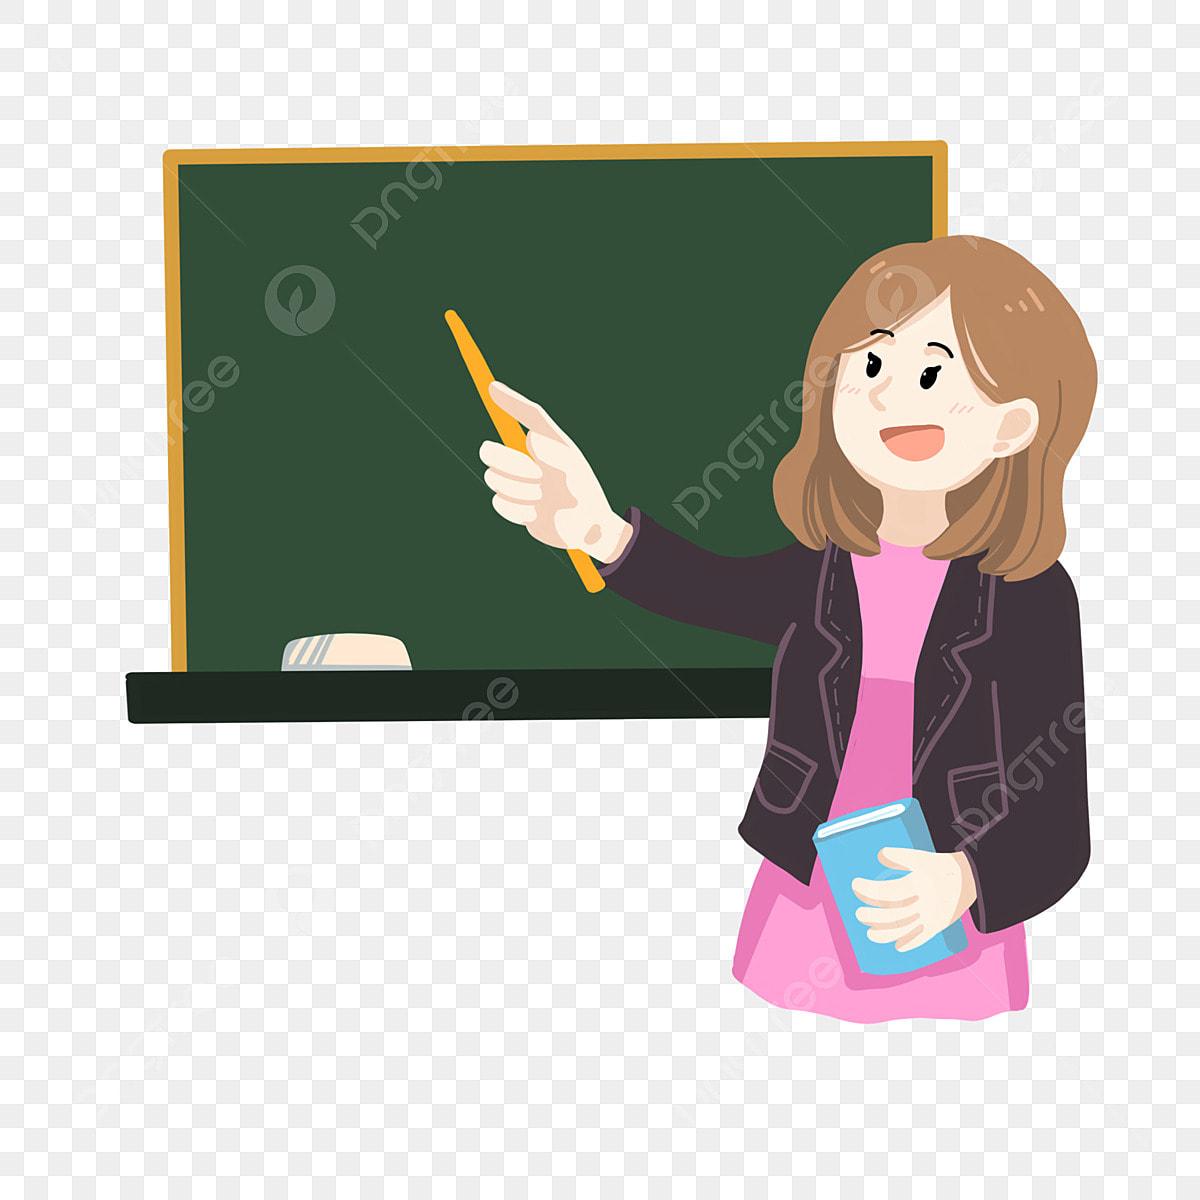 Gaya Kartun Di Kelas Guru Wanita Buku Kartun Wanita Fail